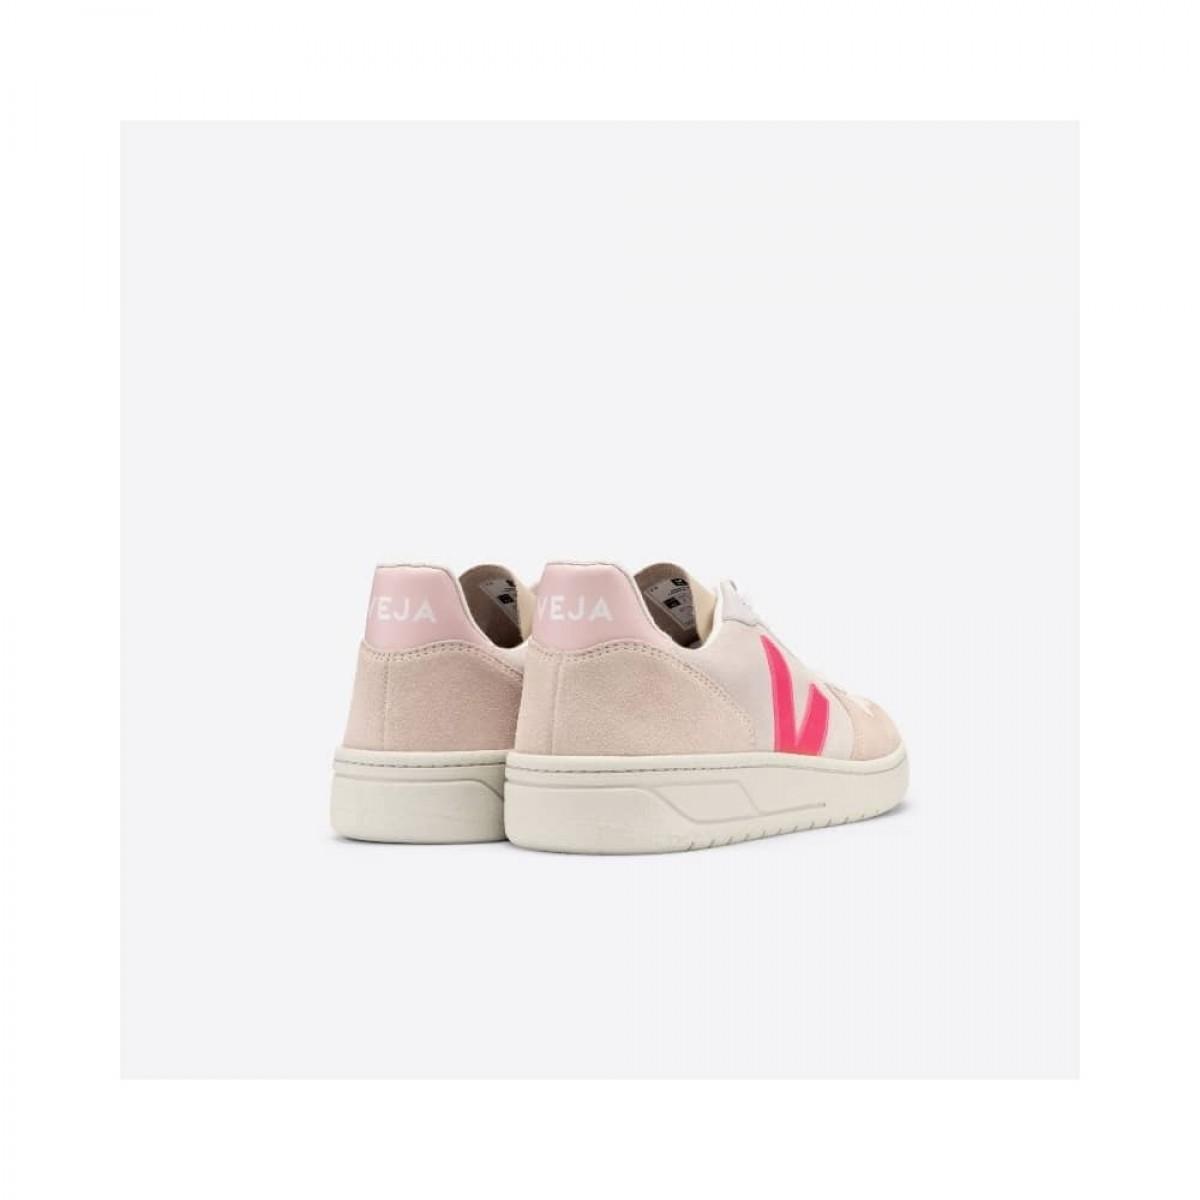 v-10 skind sneakers multico natural rose-fluo - bagfra